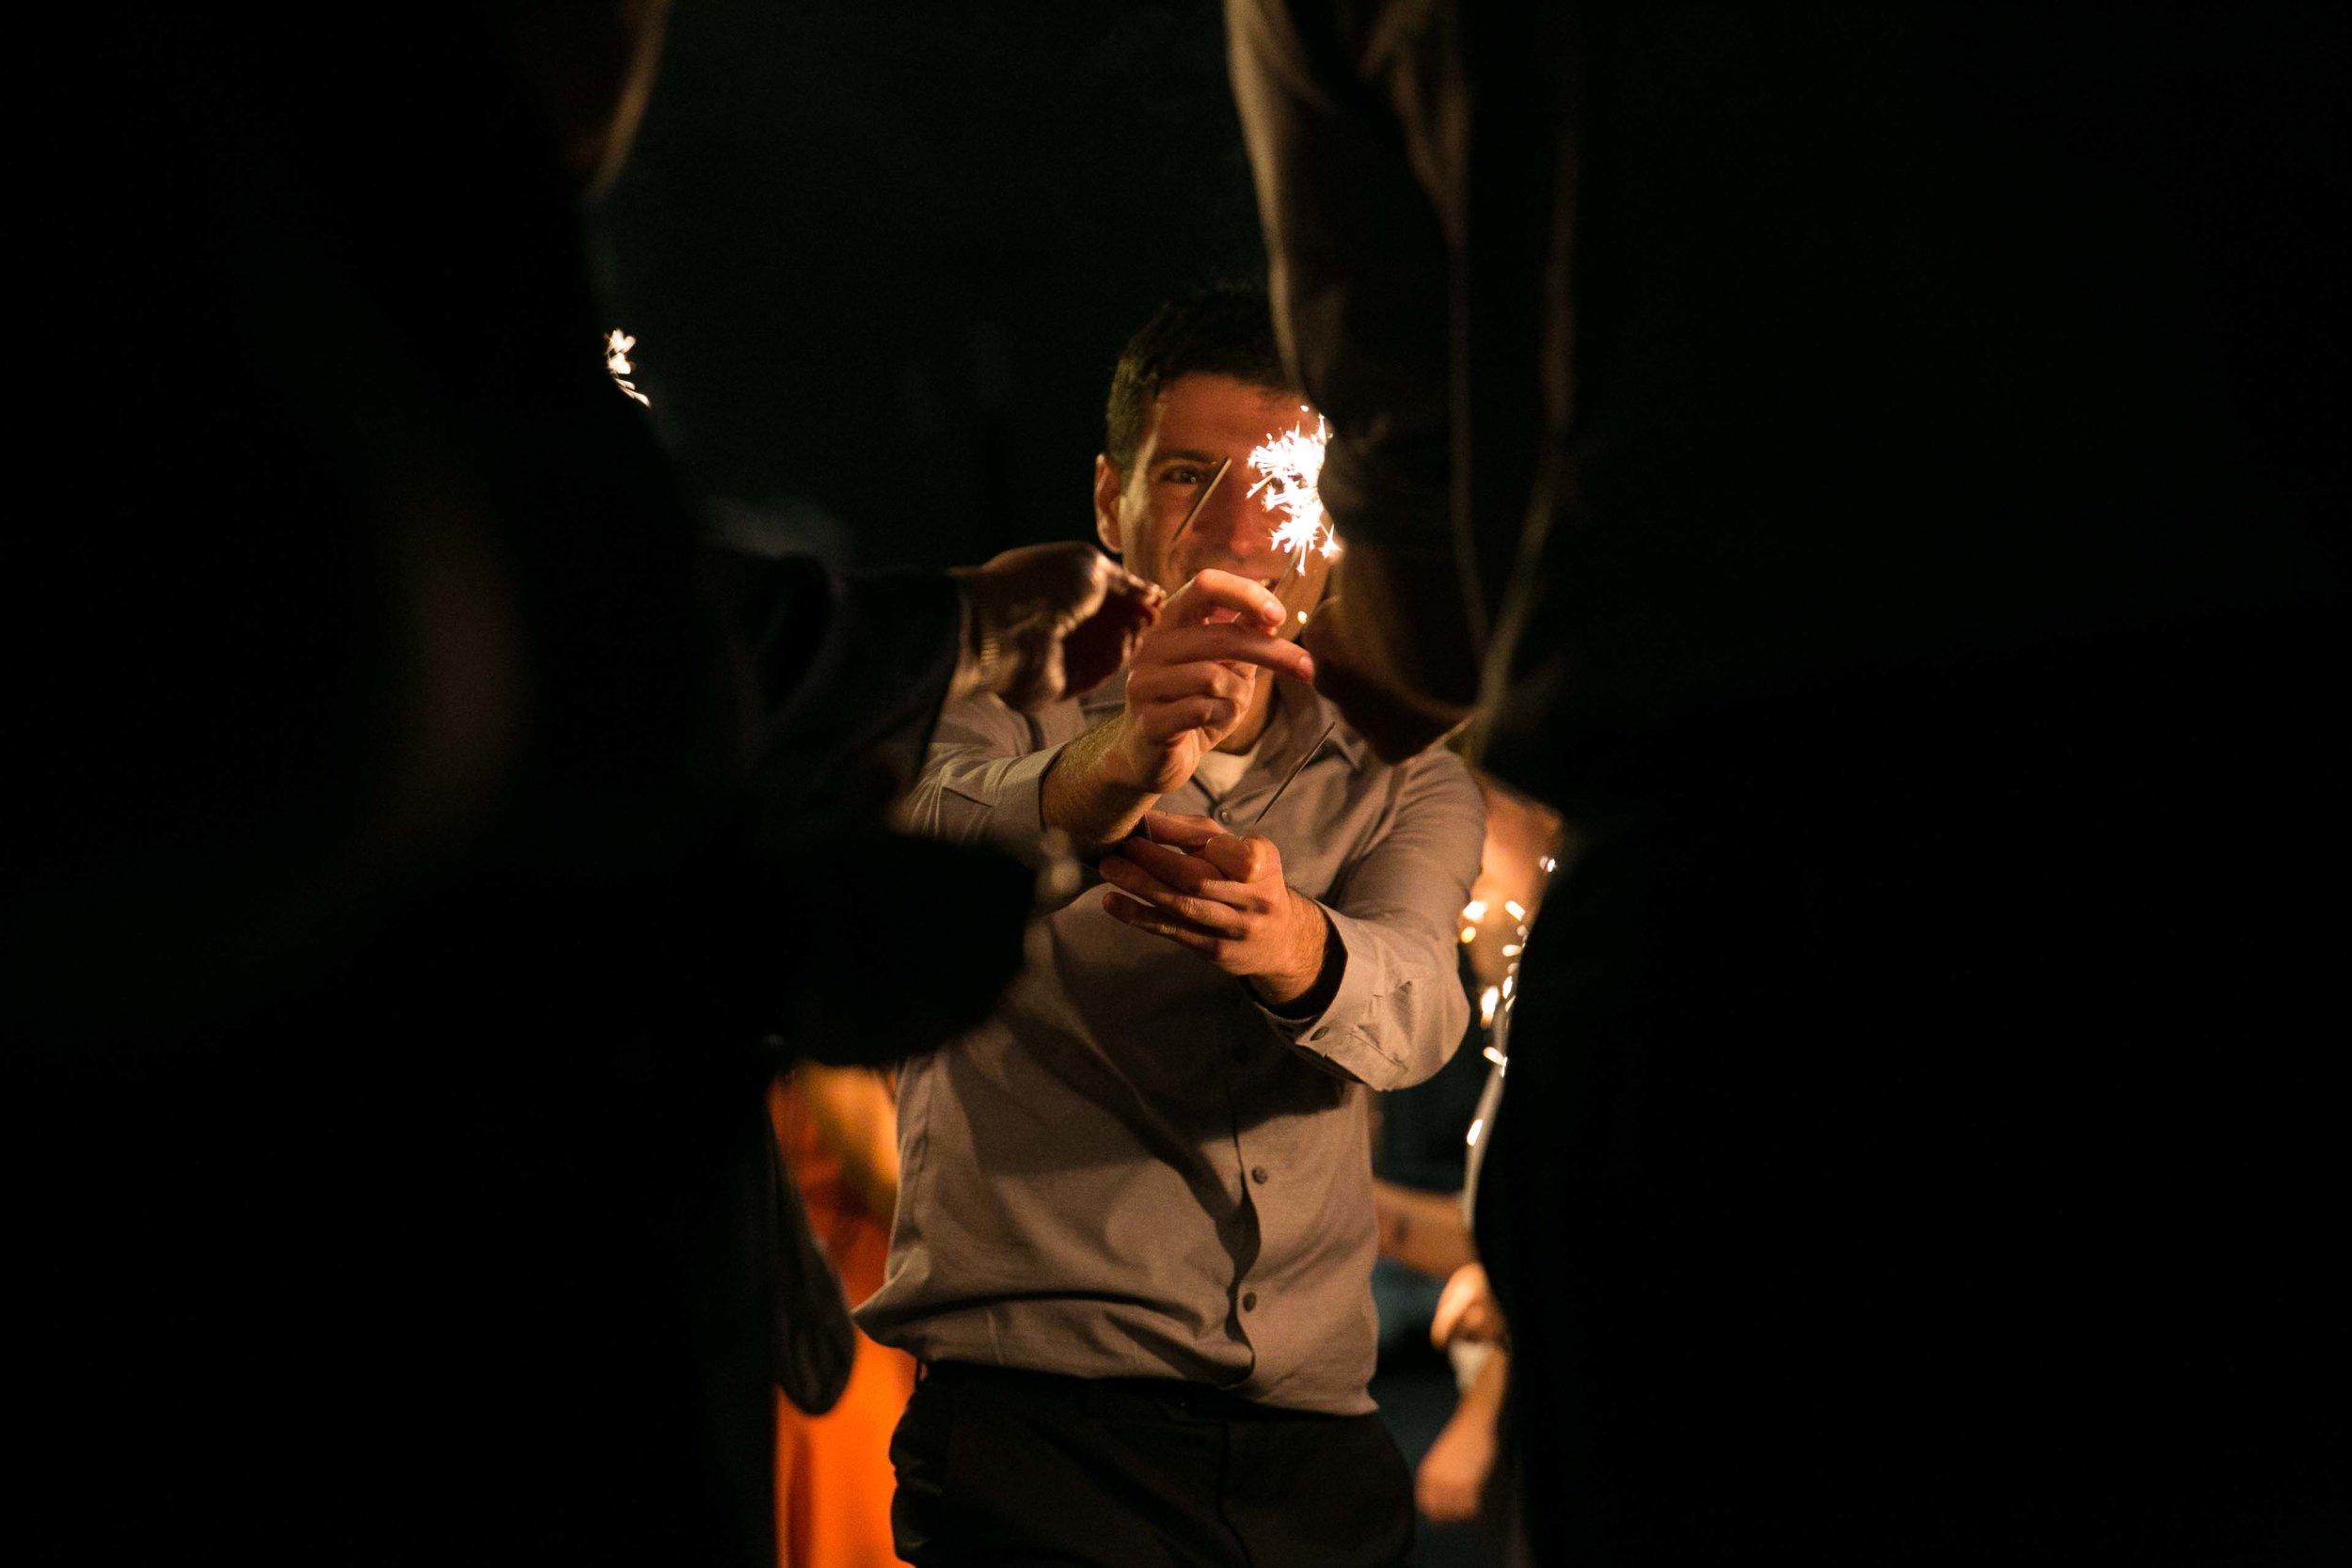 Man lighting sparkler for wedding sendoff   Durham Wedding Photographer   By G. Lin Photography